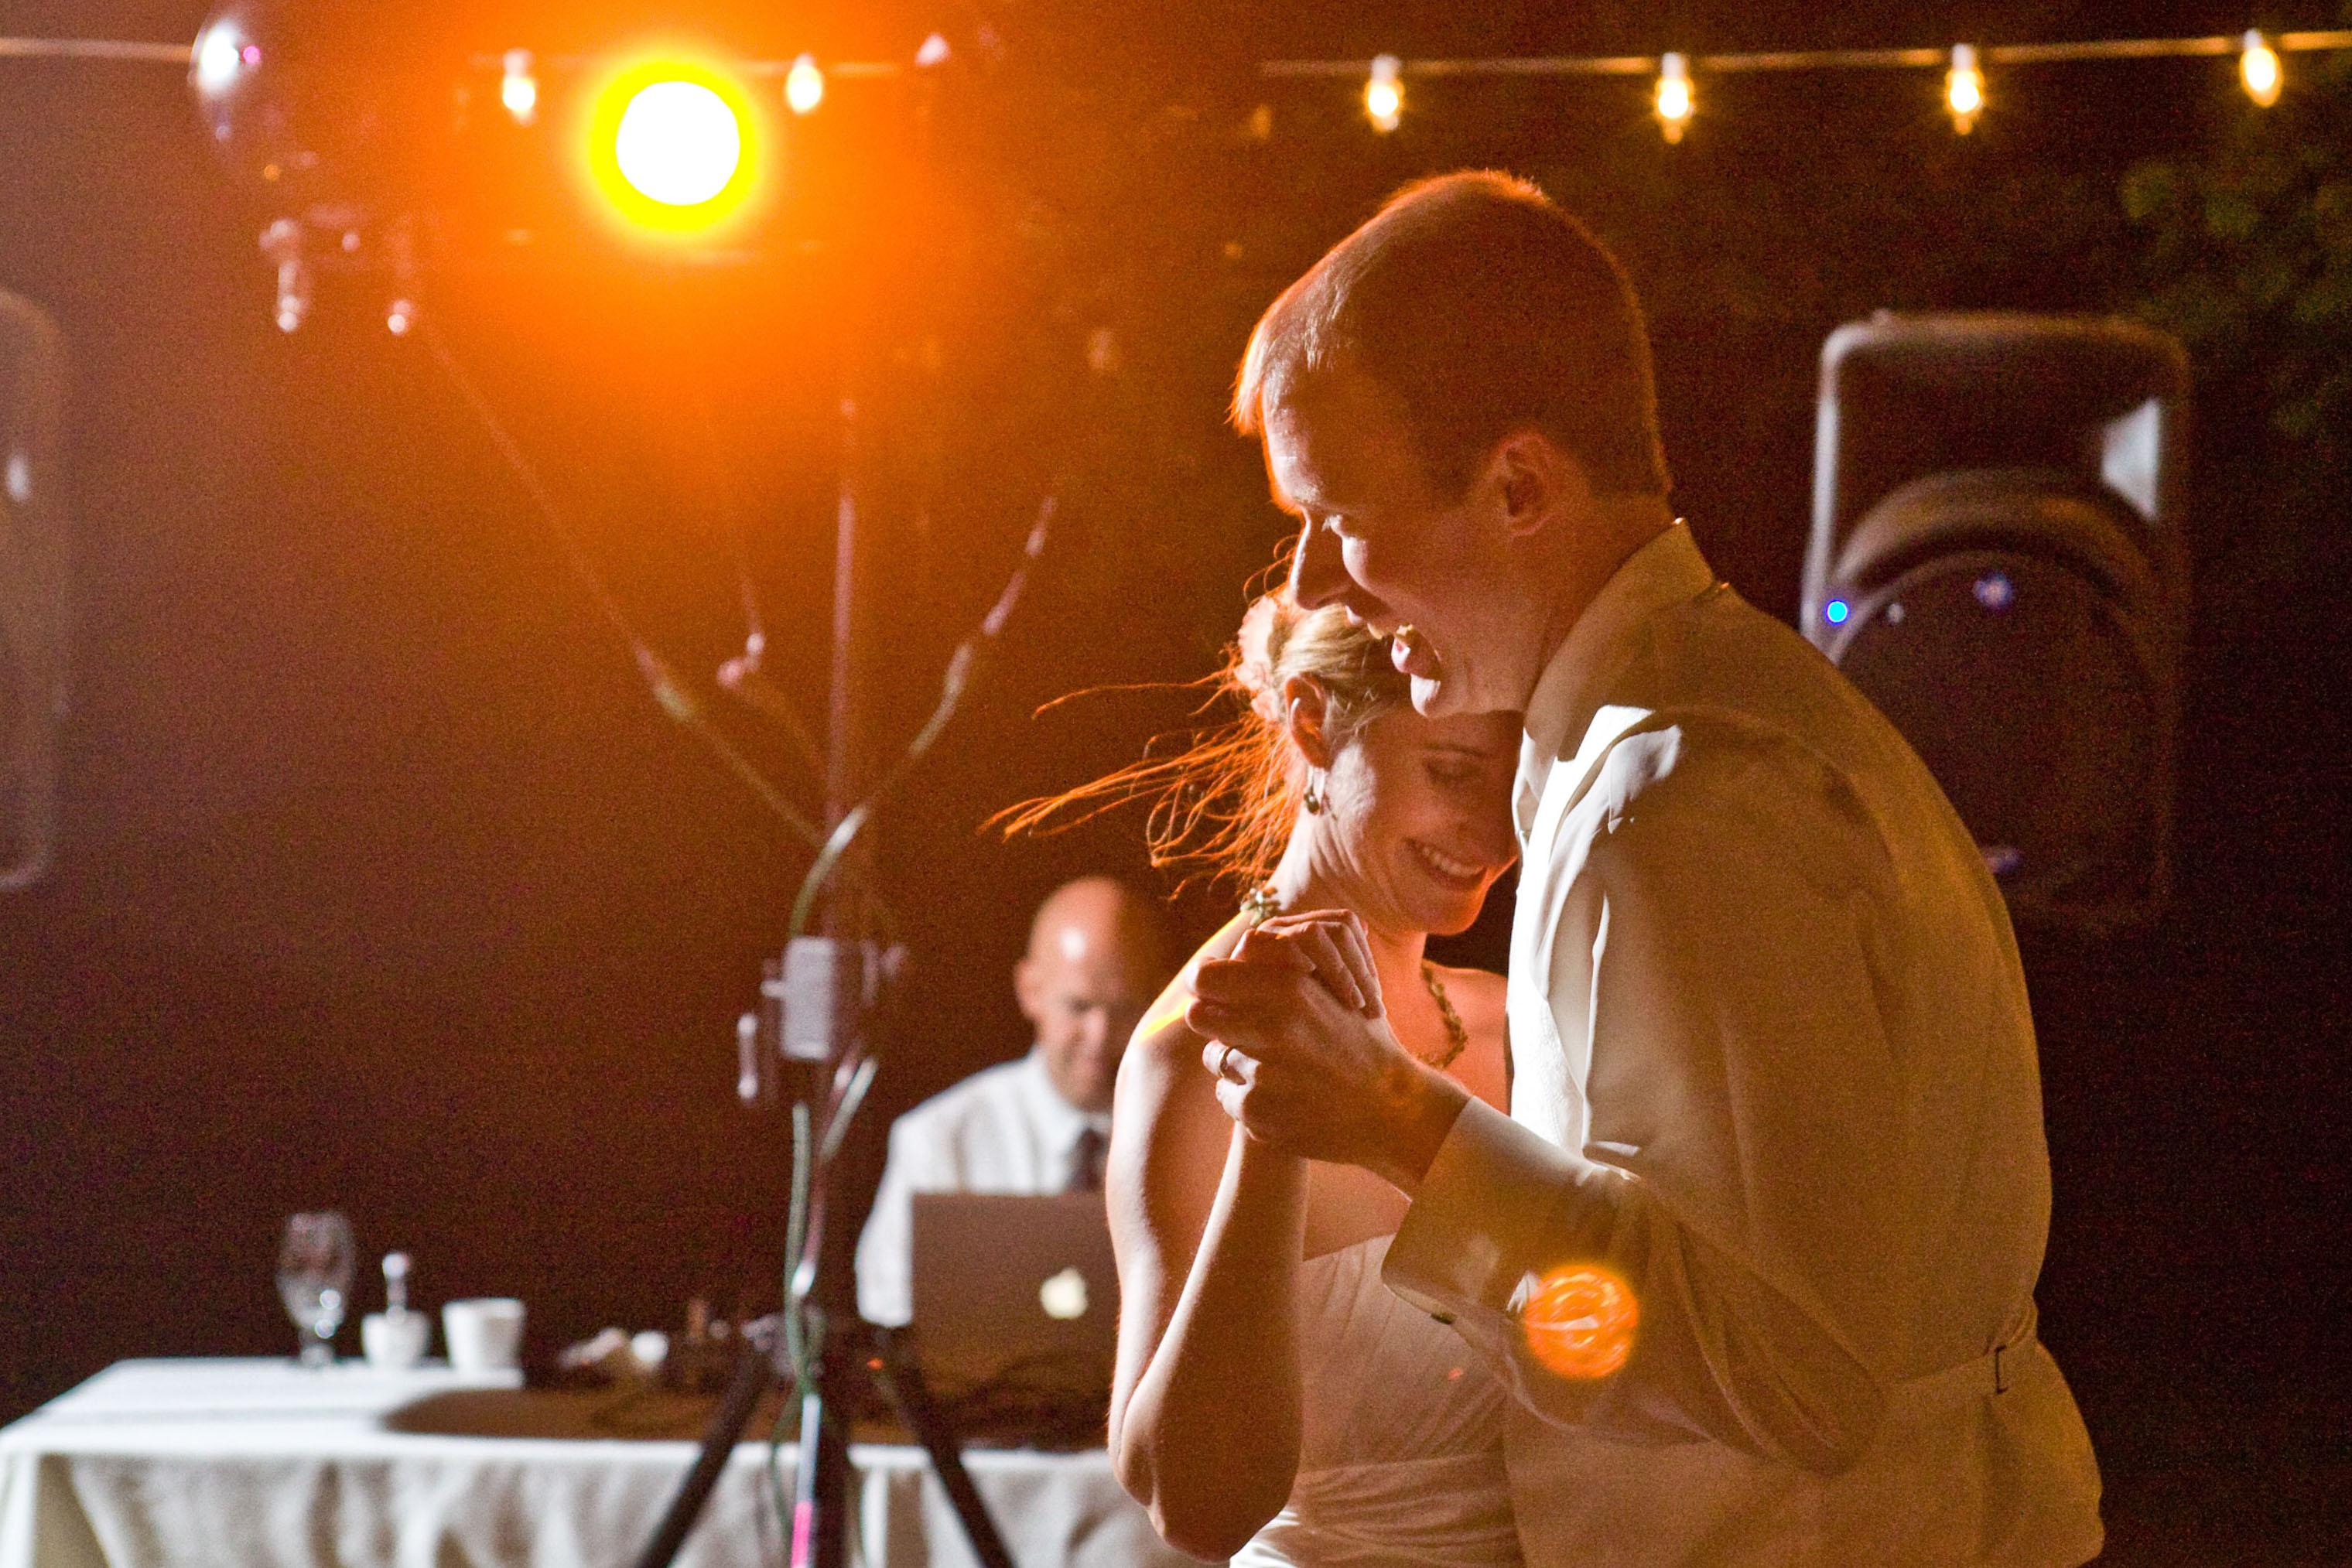 portland-wedding-dance-groom-bride